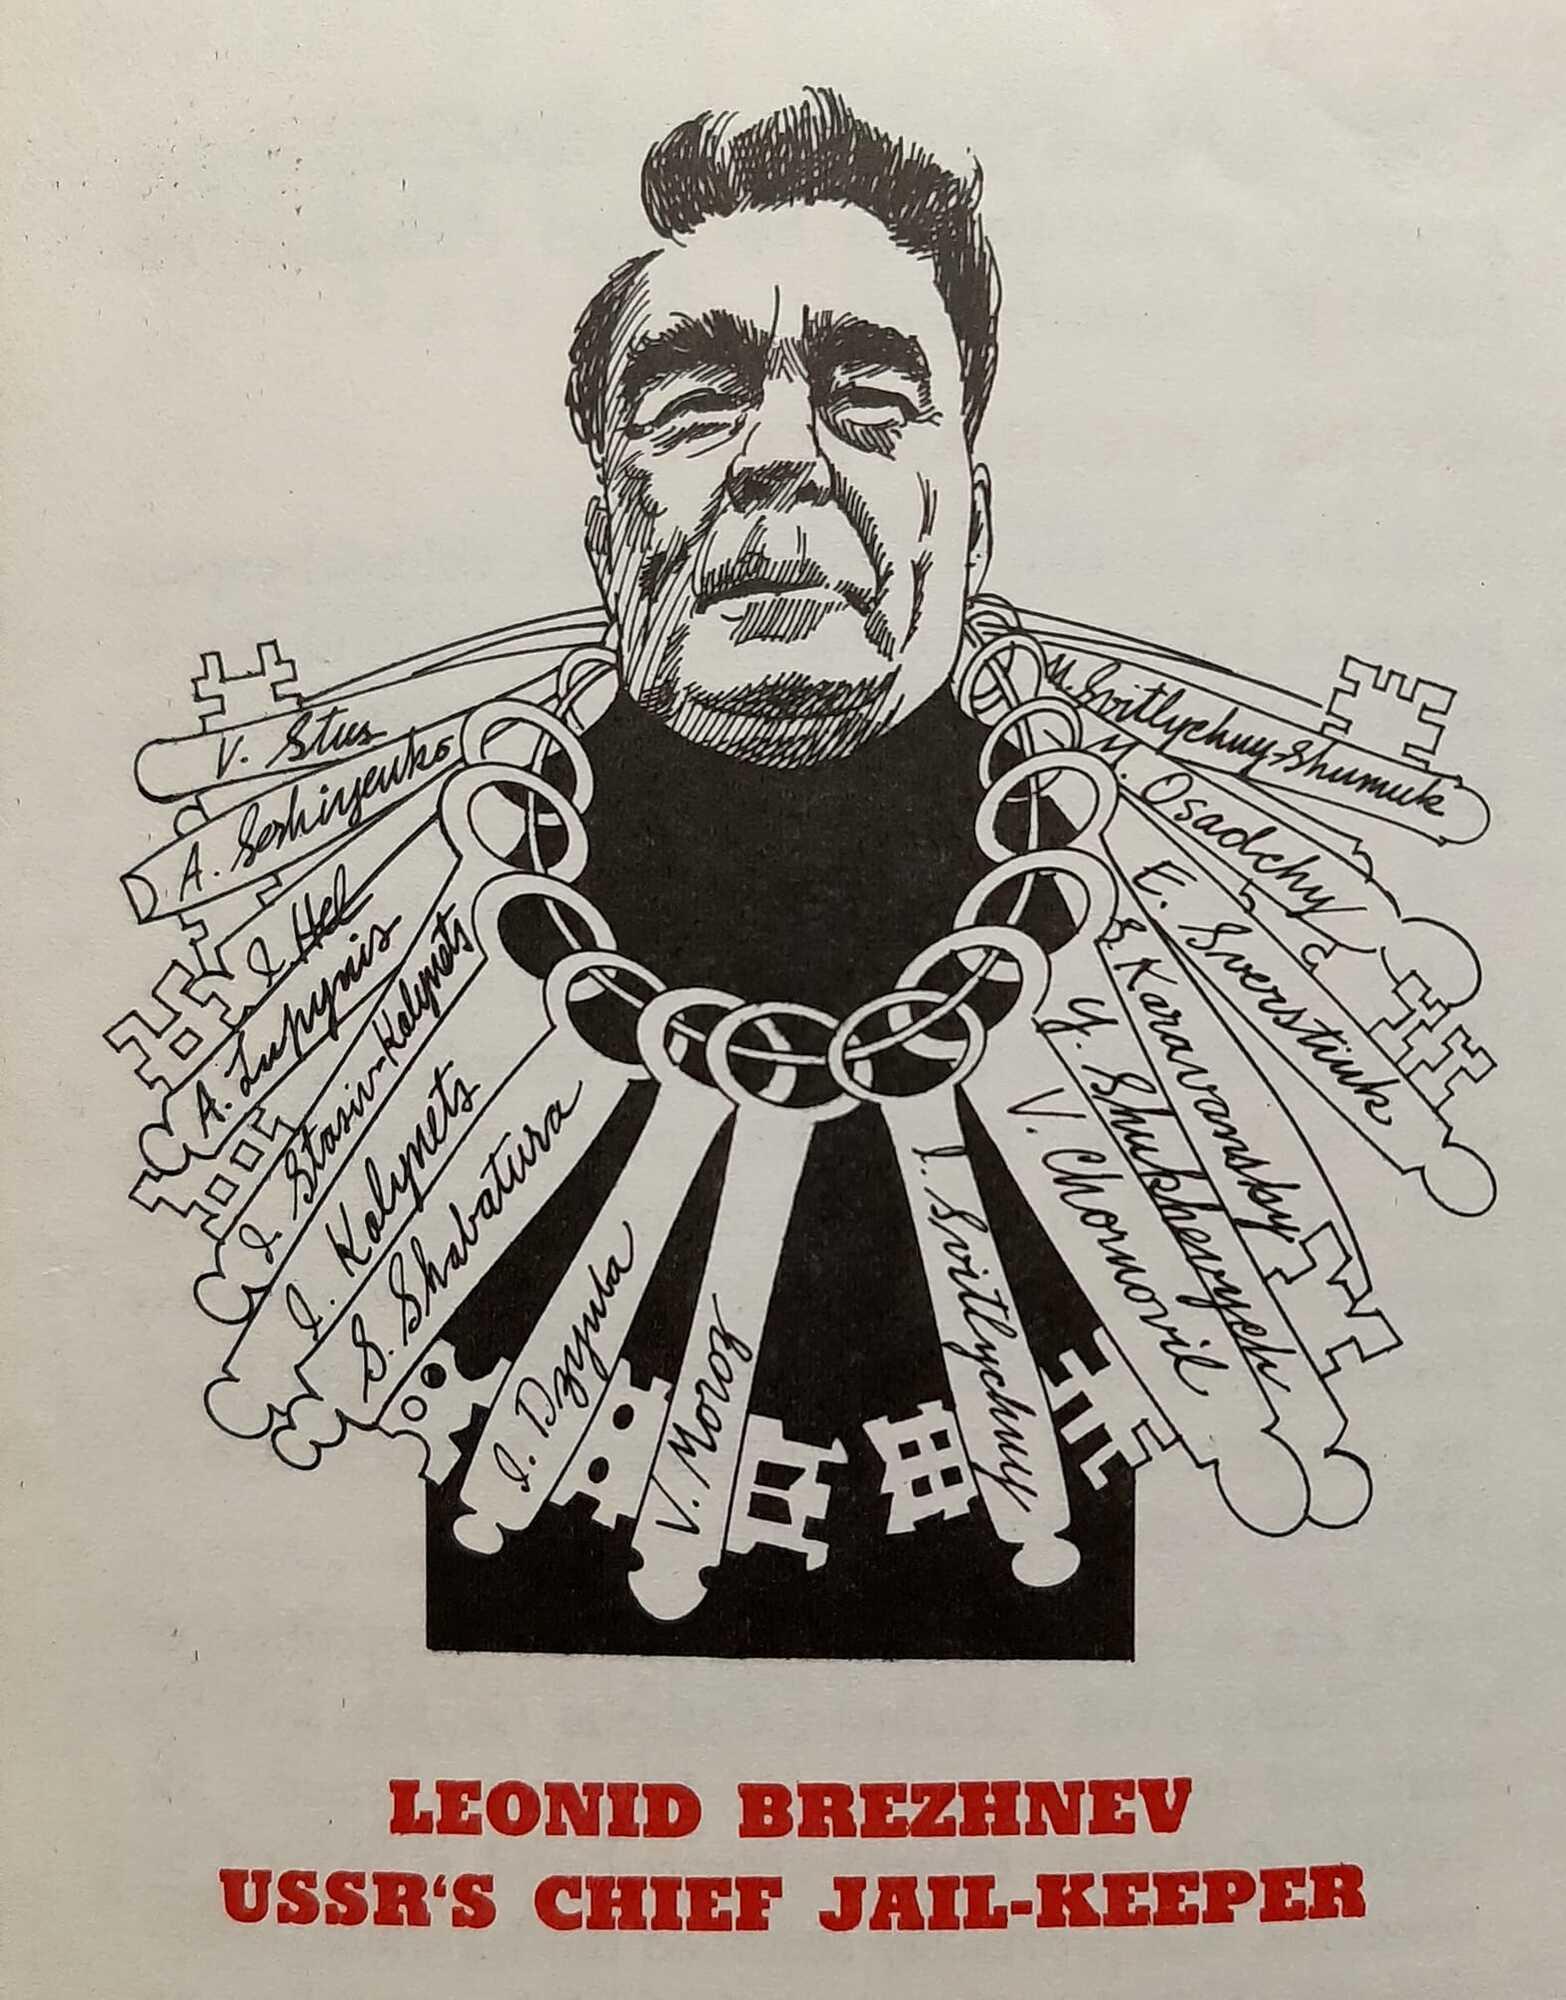 Карикатура Украинского конгрессового комитета Америки на Леонида Брежнева